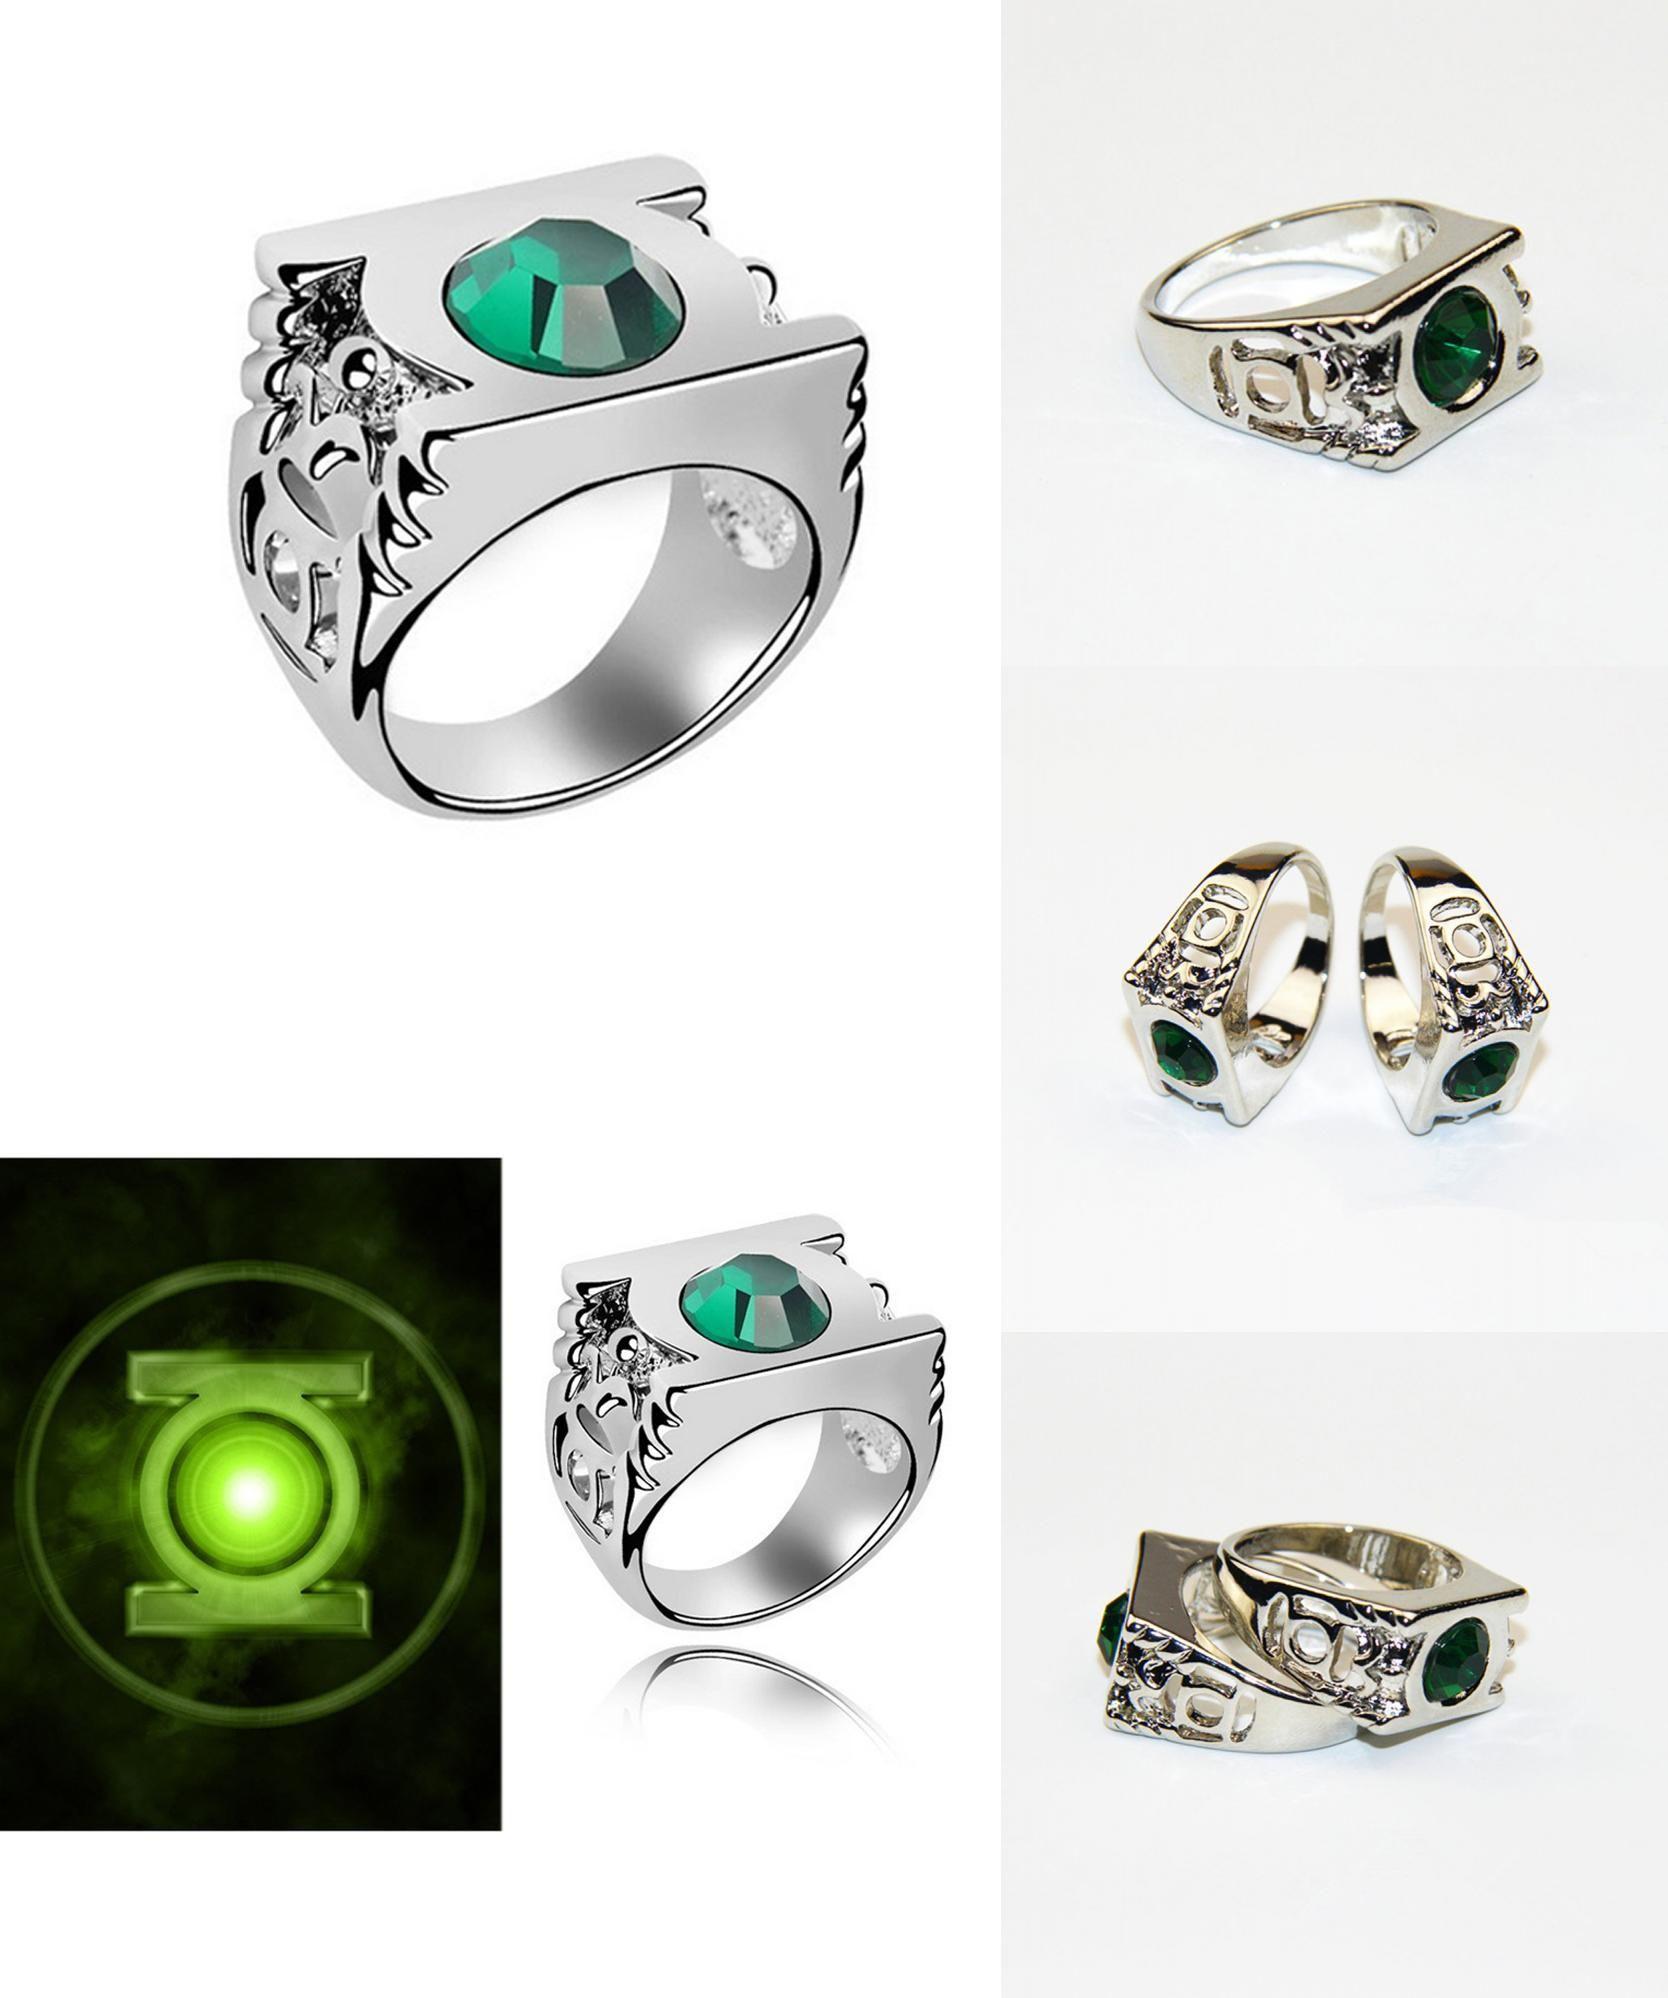 Visit To Buy New Design Style Marvel Green Lantern Ring The Crystal: Green Lantern Emerald Wedding Band Set At Websimilar.org